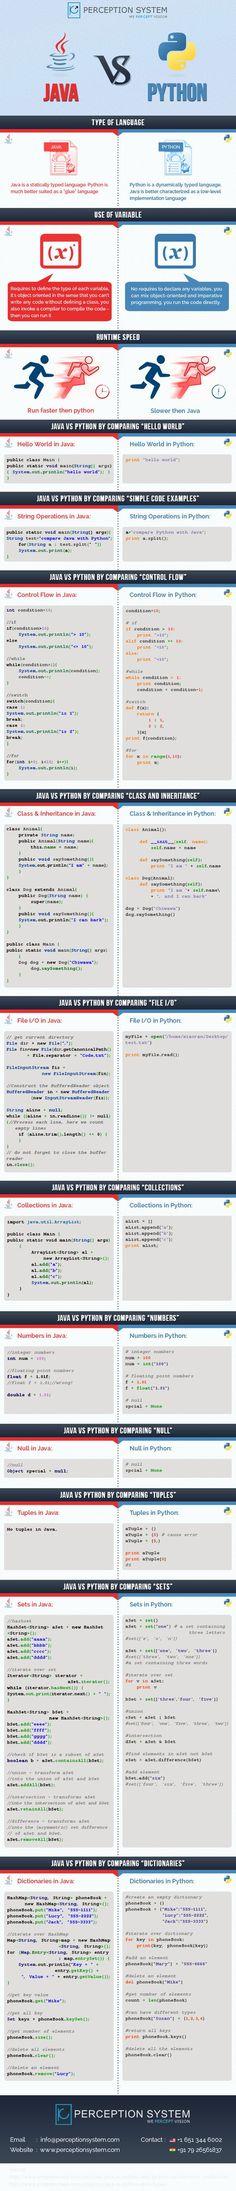 Java Vs. Python- Which Programming Language is More Productive?...  #java #python #infographic: